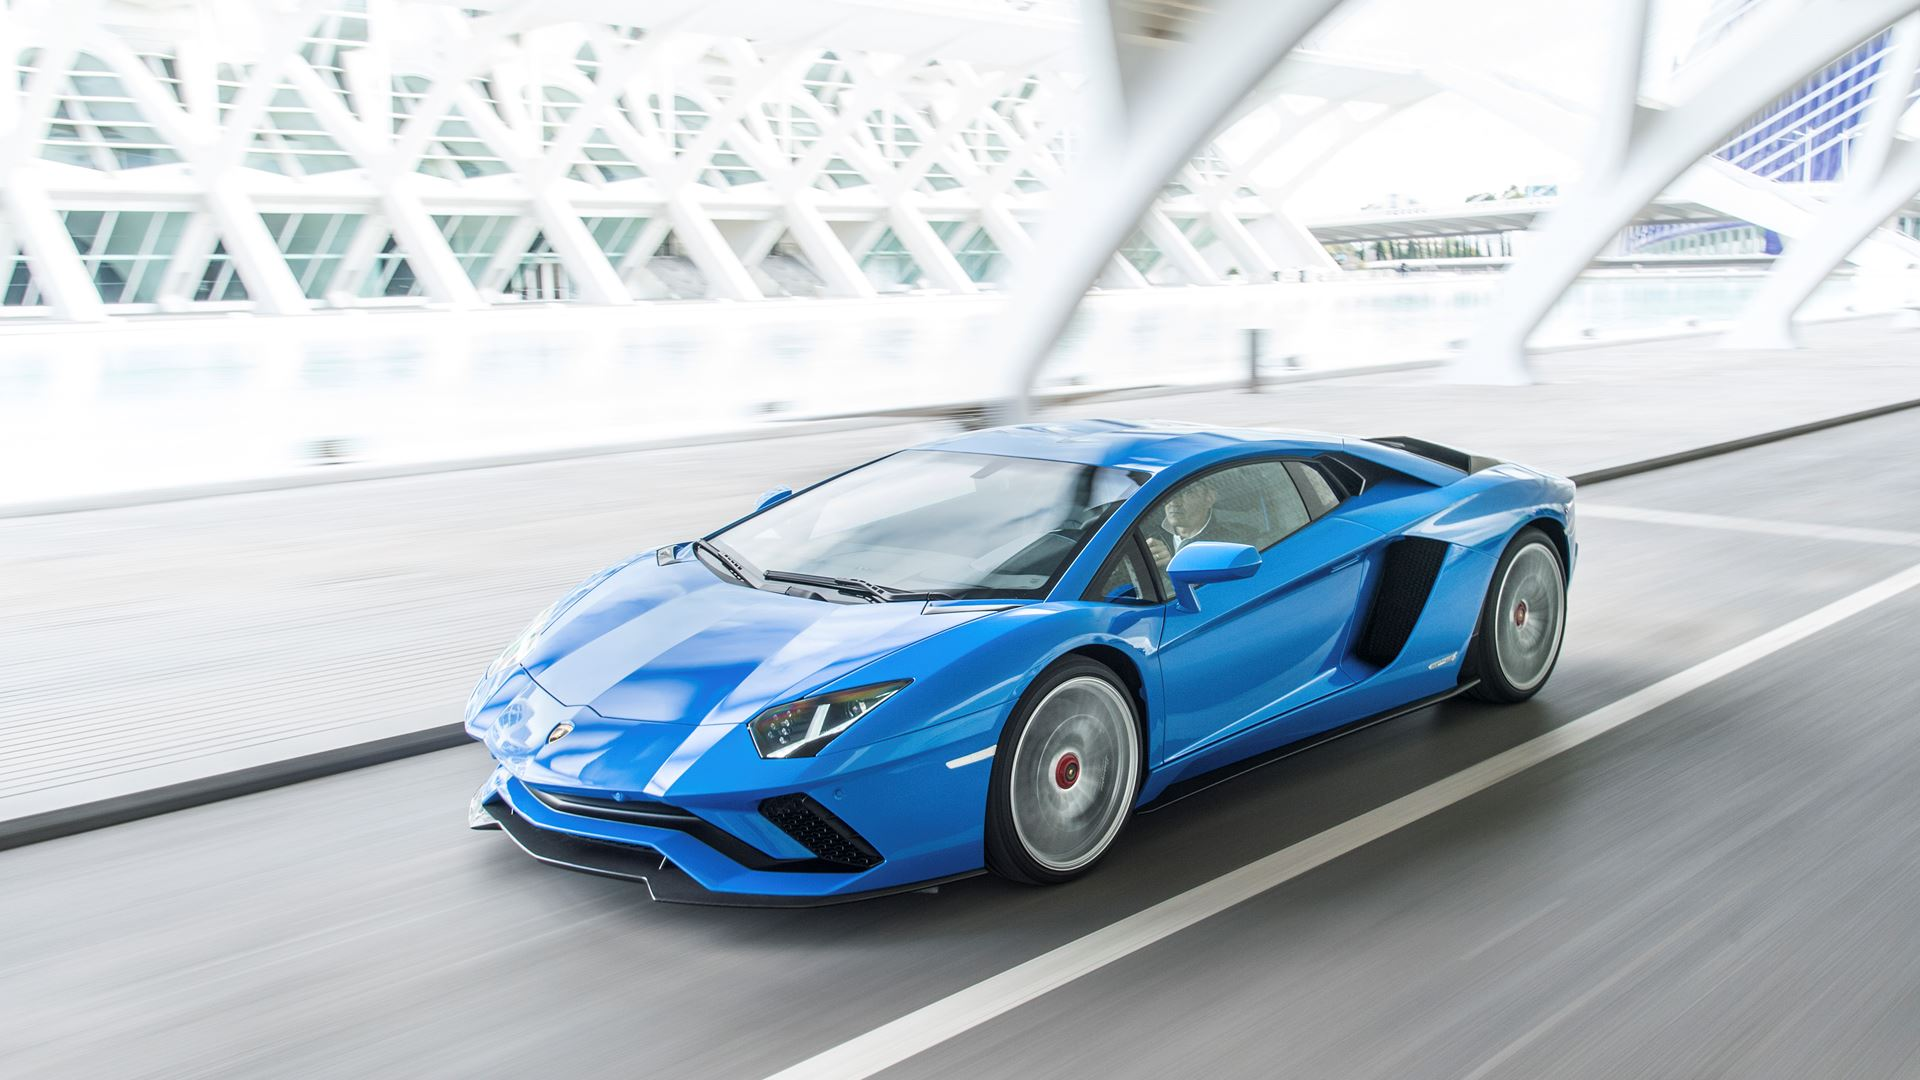 Lamborghini Aventador: 10 innovations in 10 years - Image 1